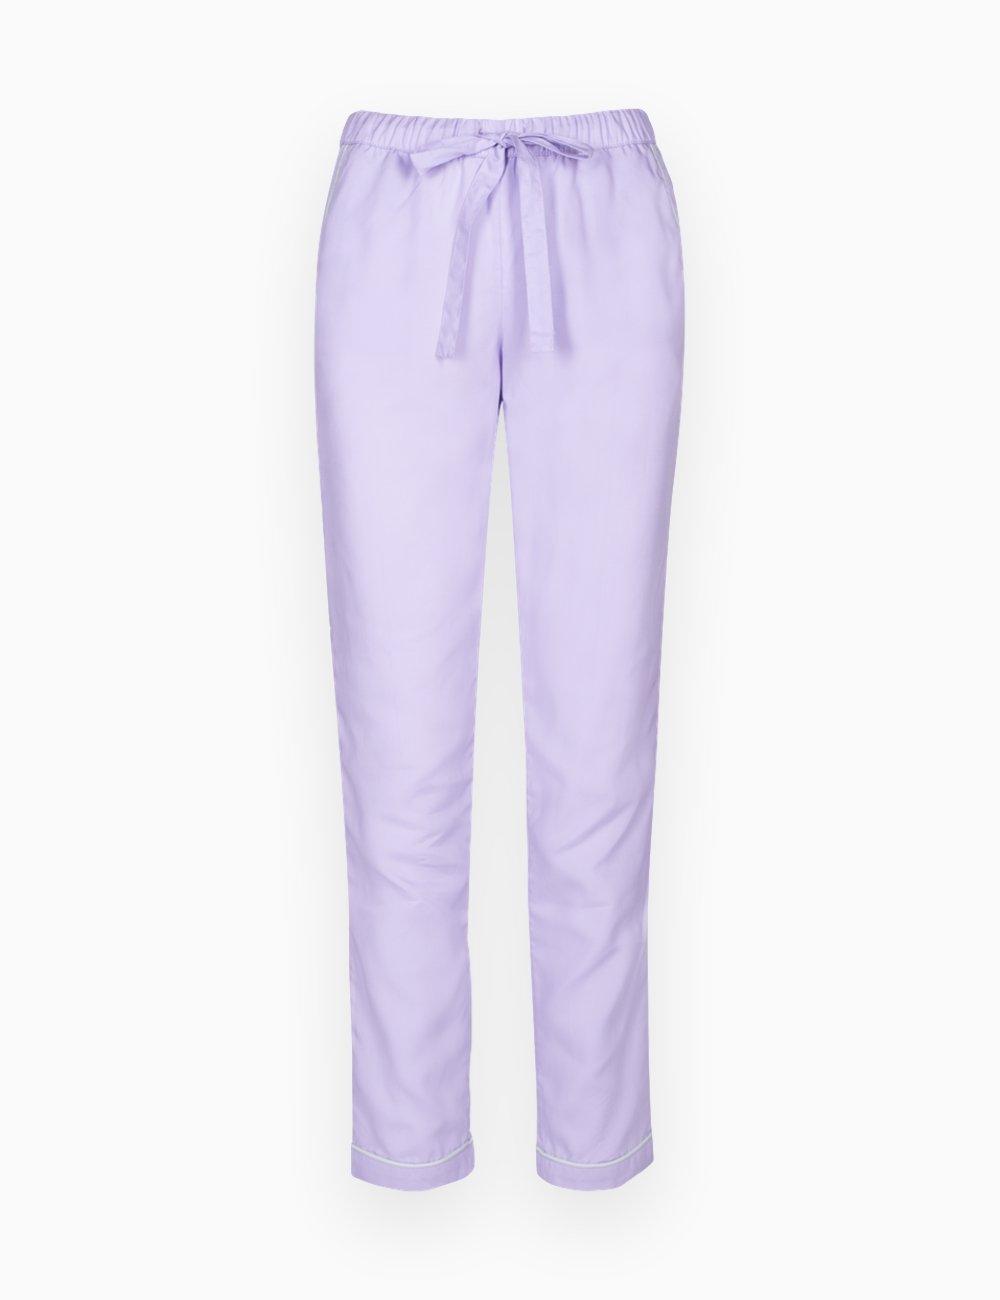 Pyjama Bottoms Lavender Love